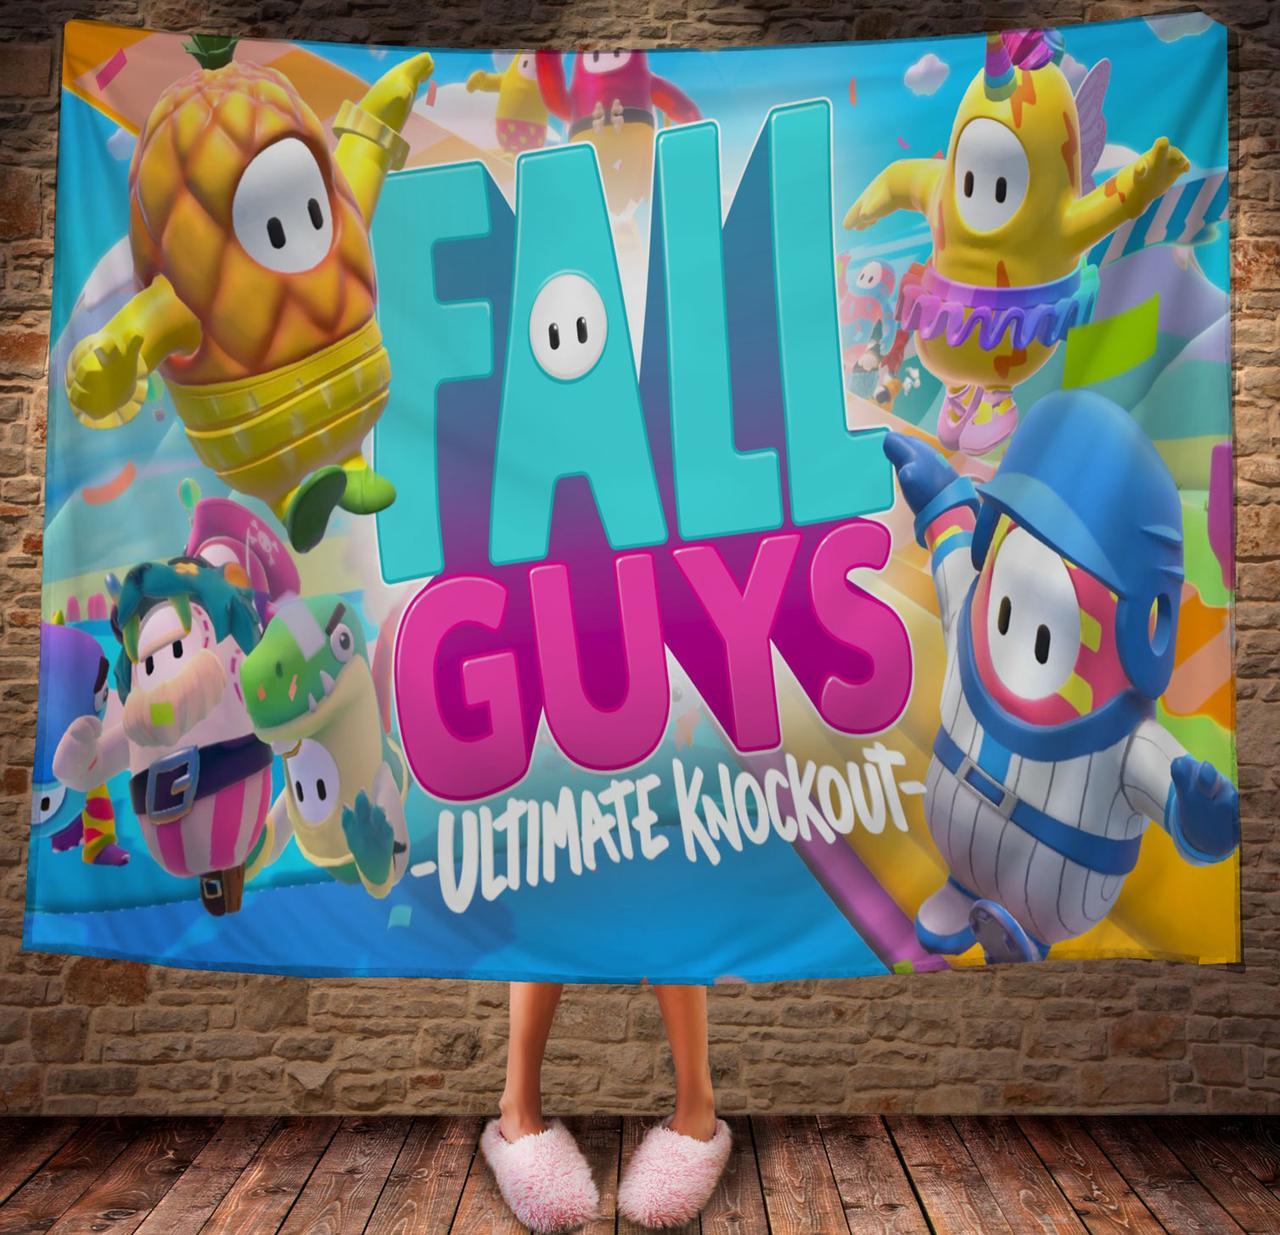 Плед с 3D принтом Fall Guys Ultimate Knockout Все герои